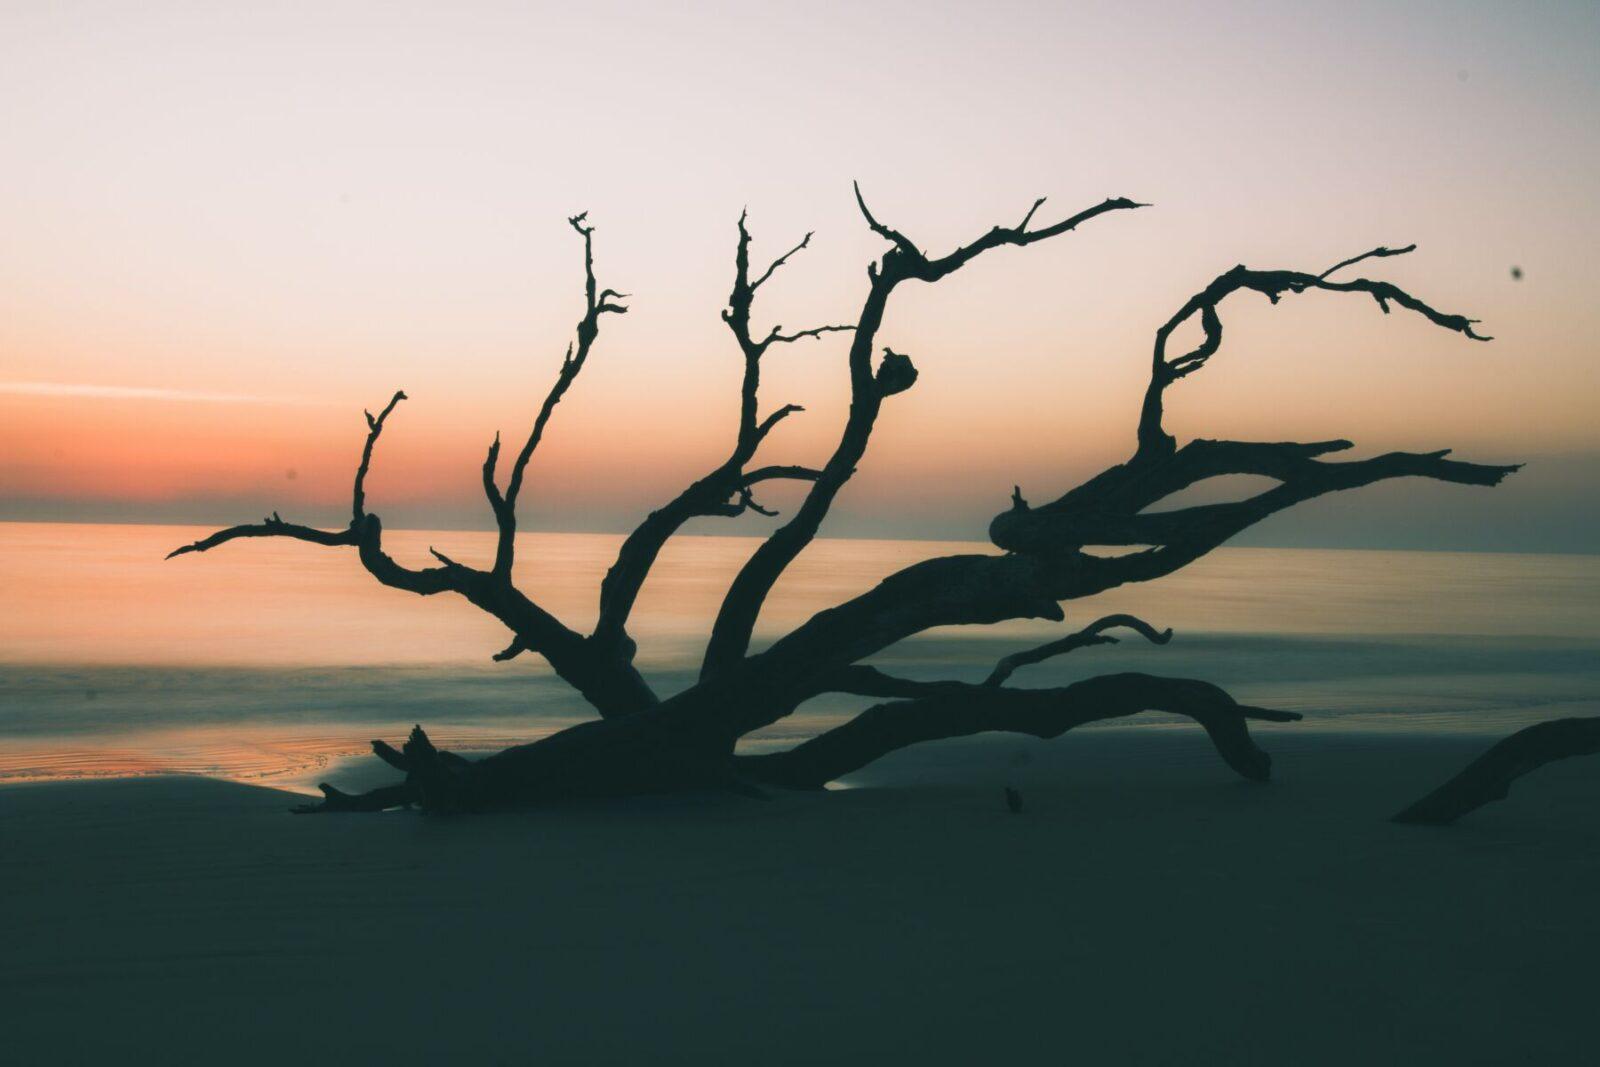 jekyll island silhouette of tree on beach